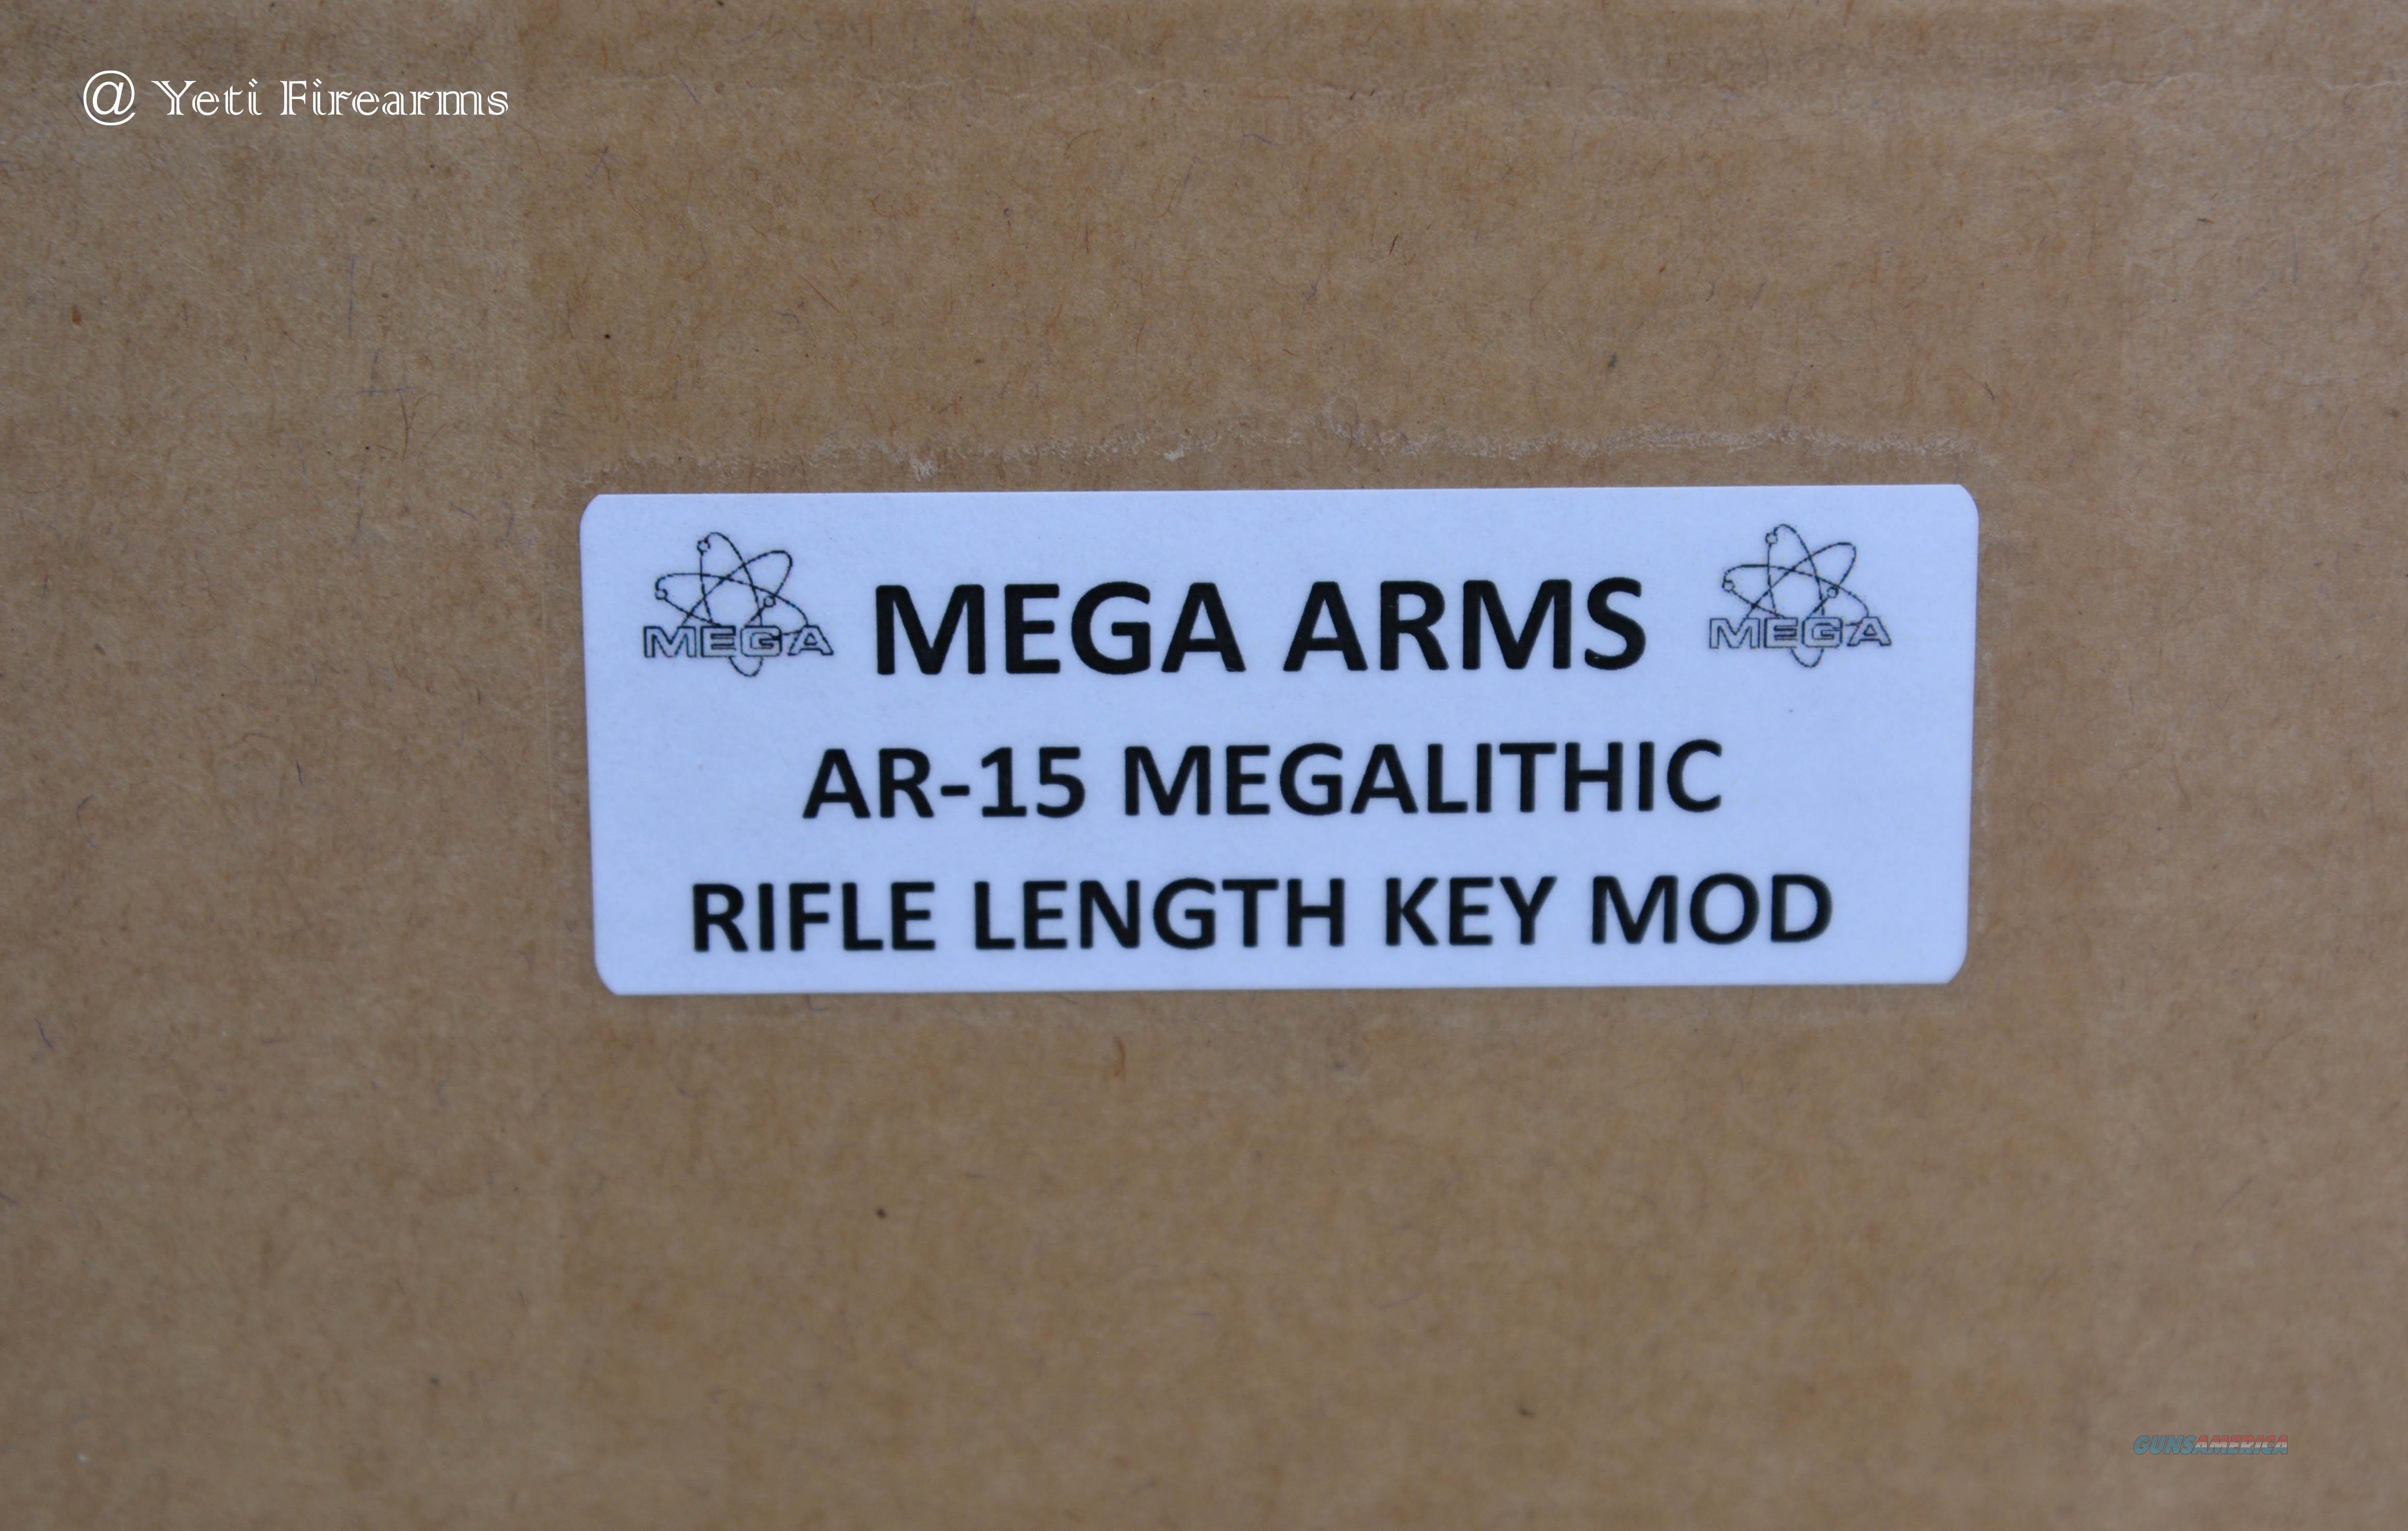 Mega Arms Megalithic AR-15 Upper MTS-440 Key Mod